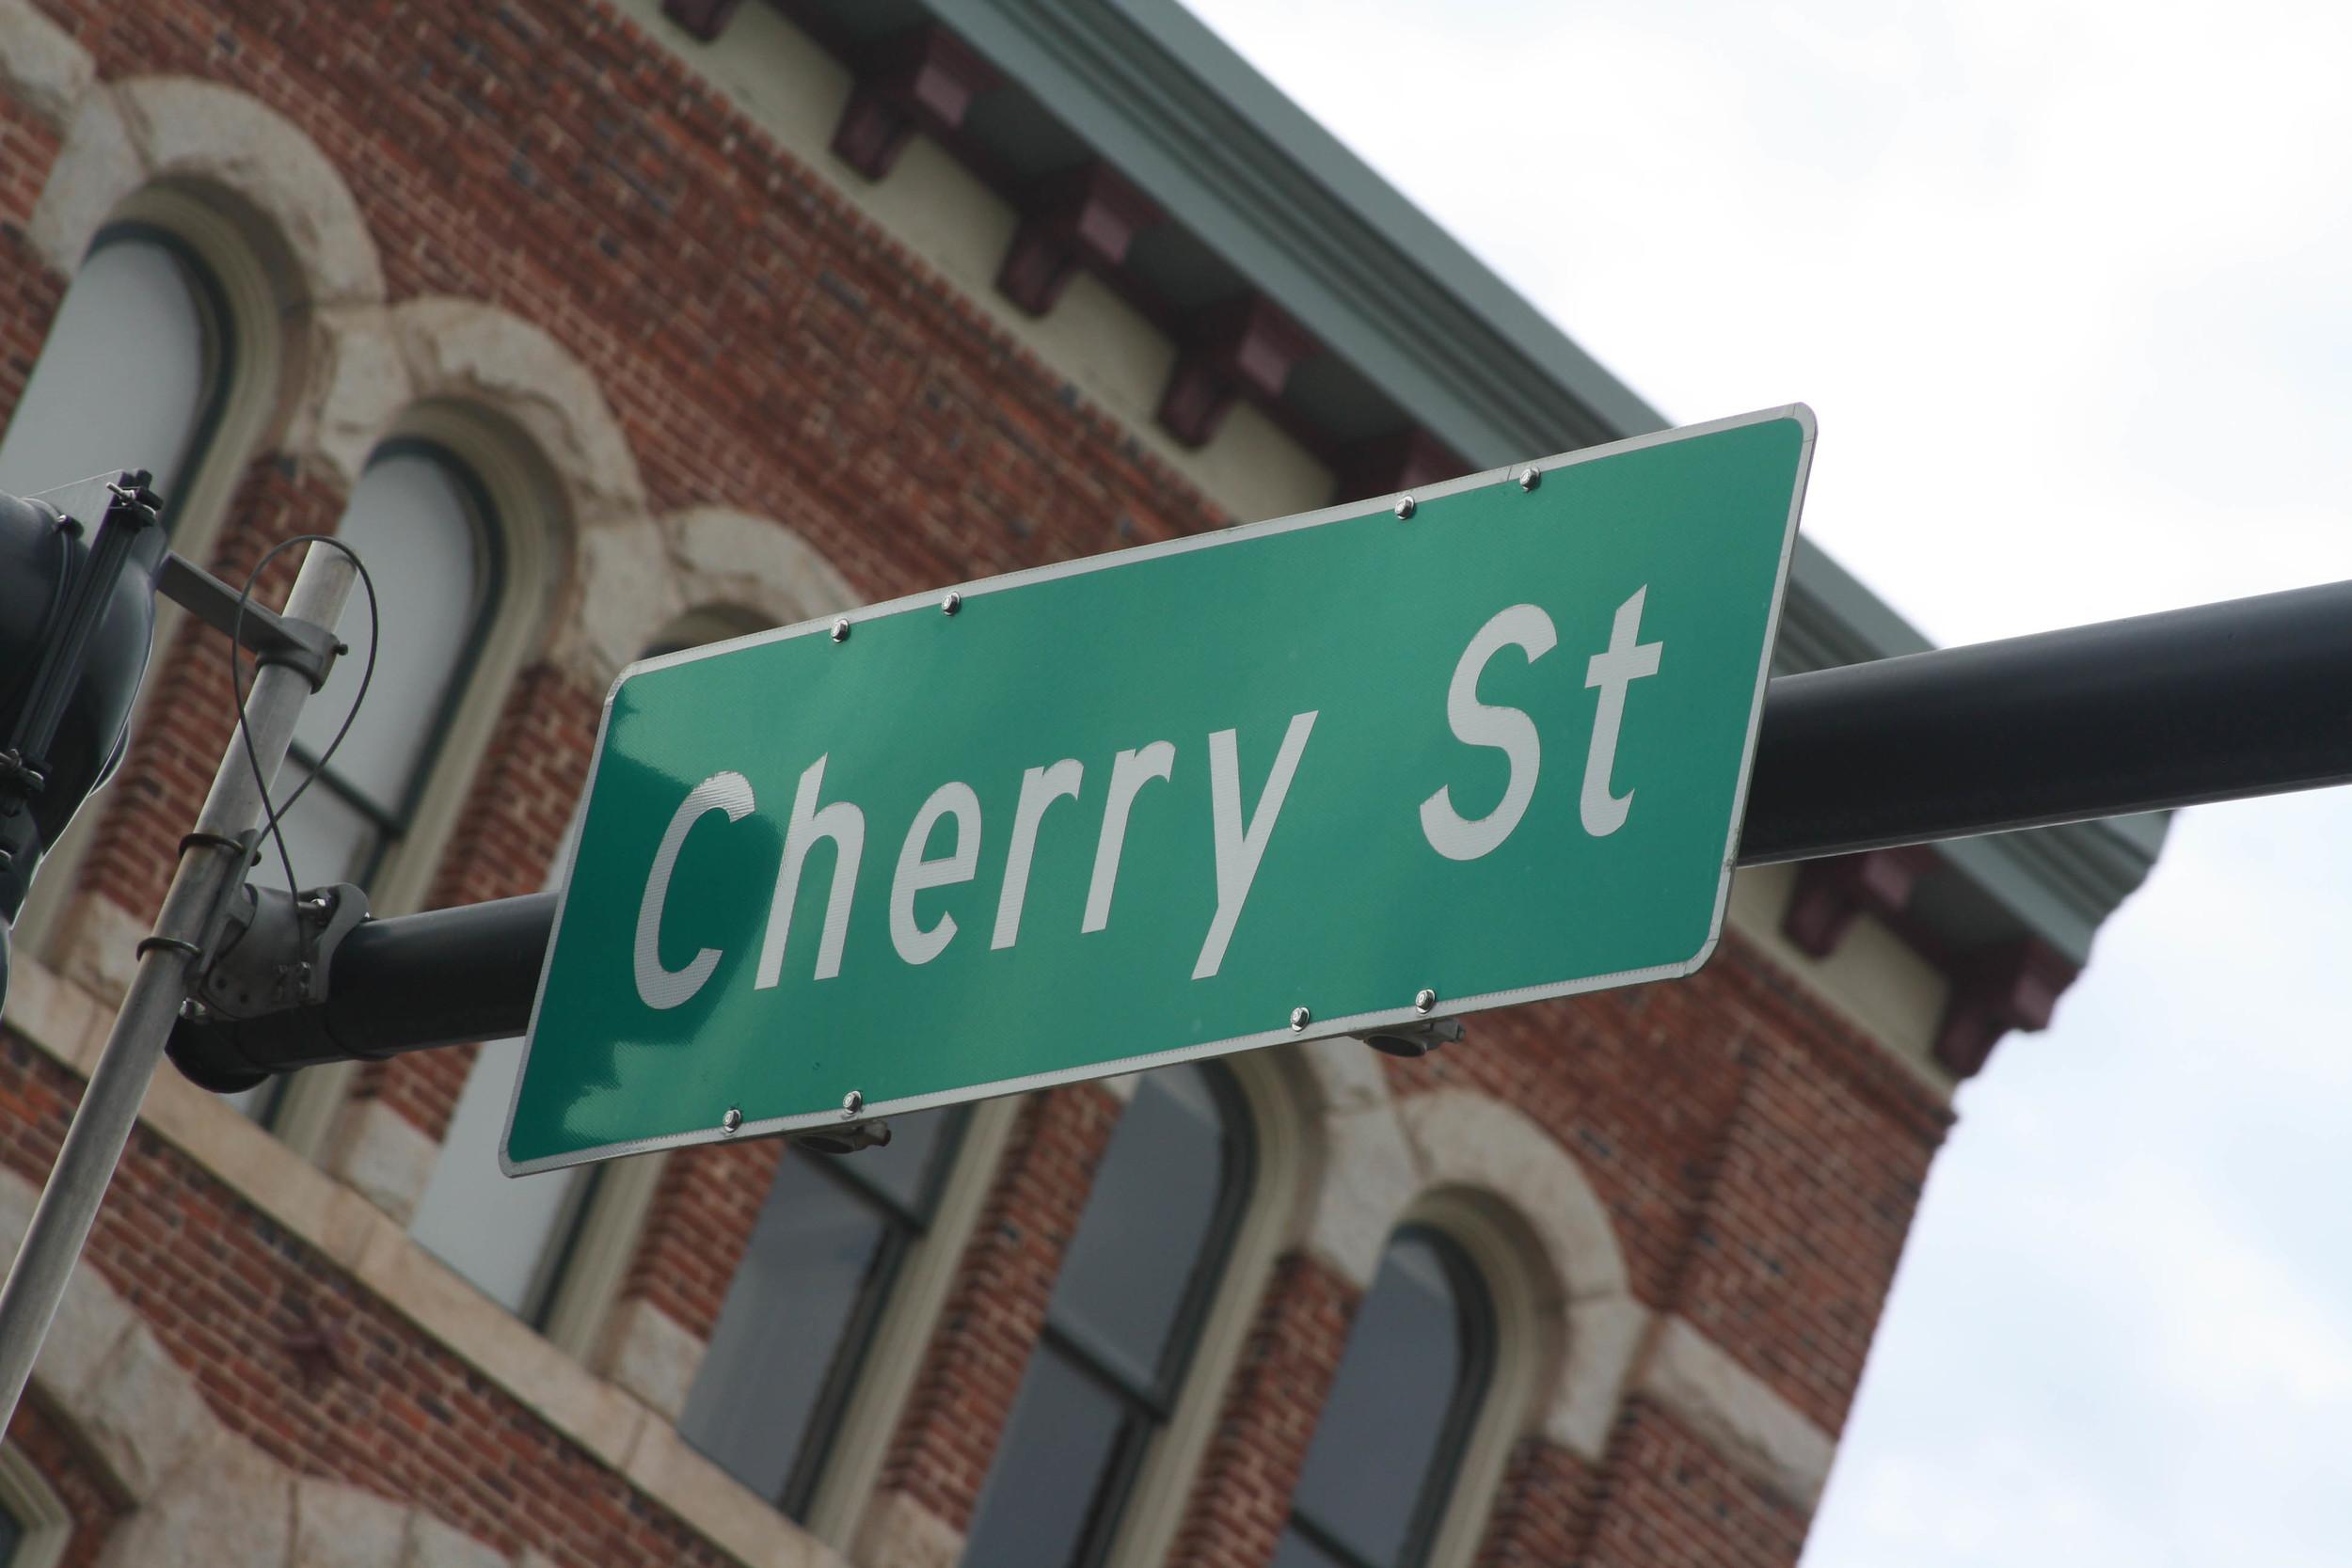 Cherry-street-Macon.jpg